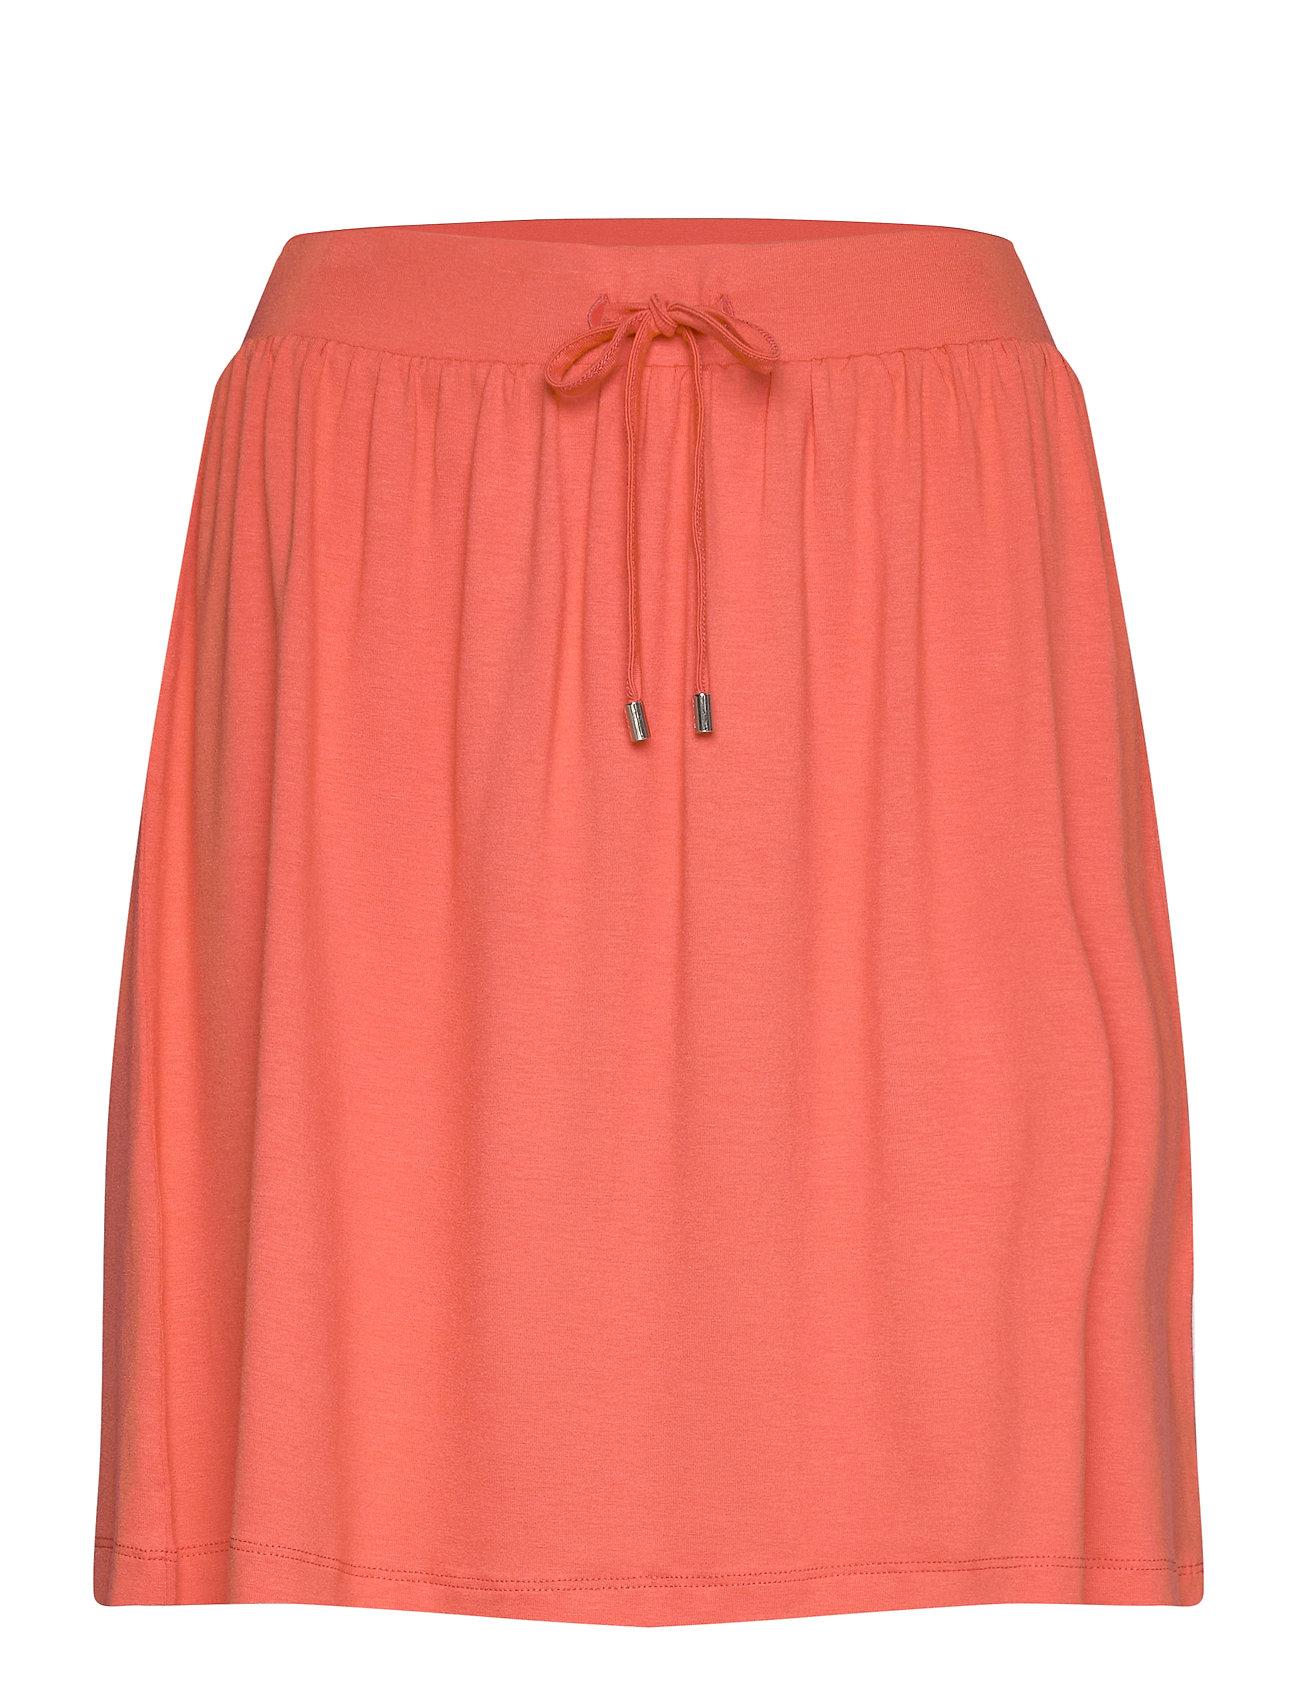 Image of Skirts Knitted Kort Nederdel Rød Esprit Casual (3421207303)